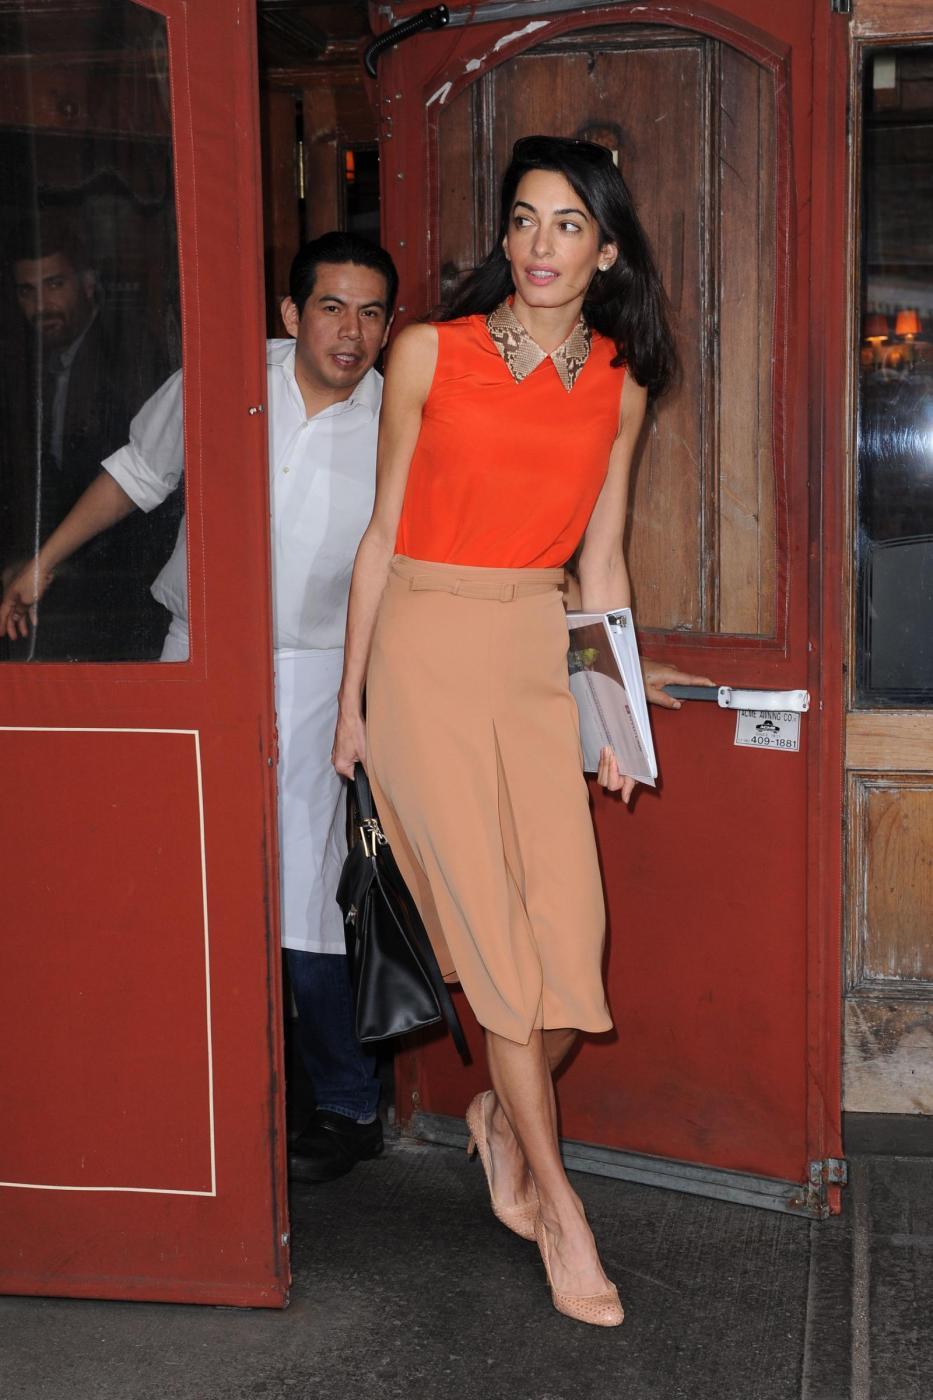 Amal Alamuddin magrissima, lady Clooney quasi scheletrica FOTO 111